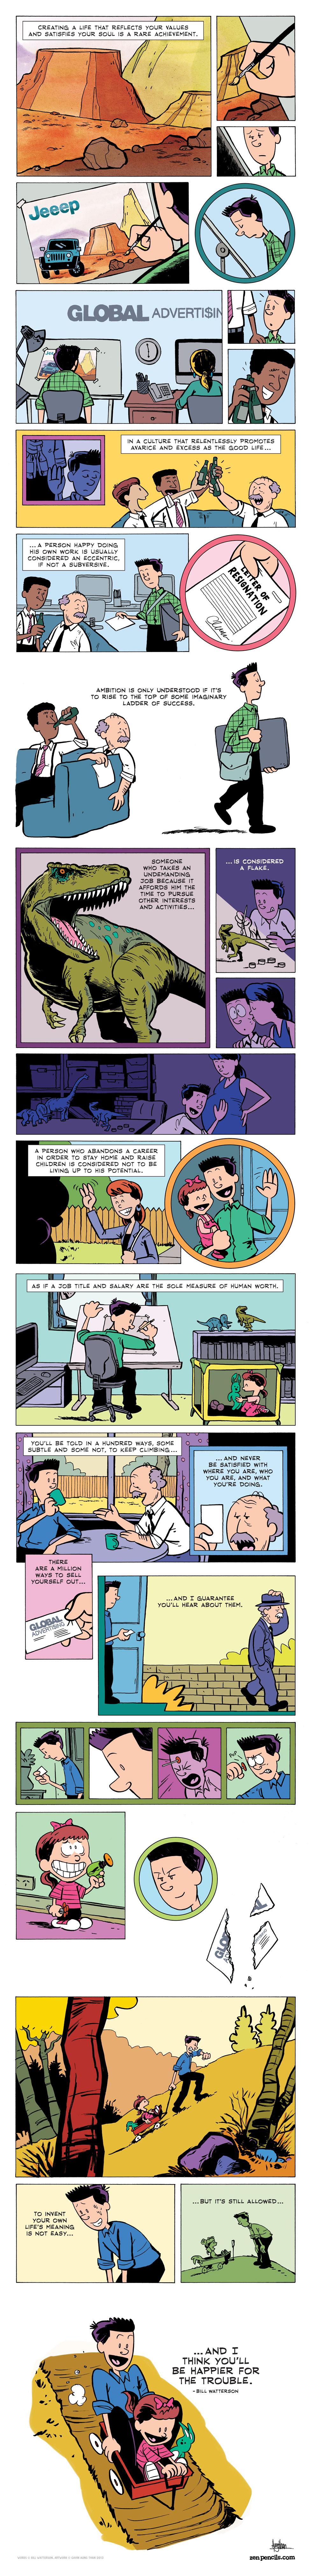 Life lesson comic